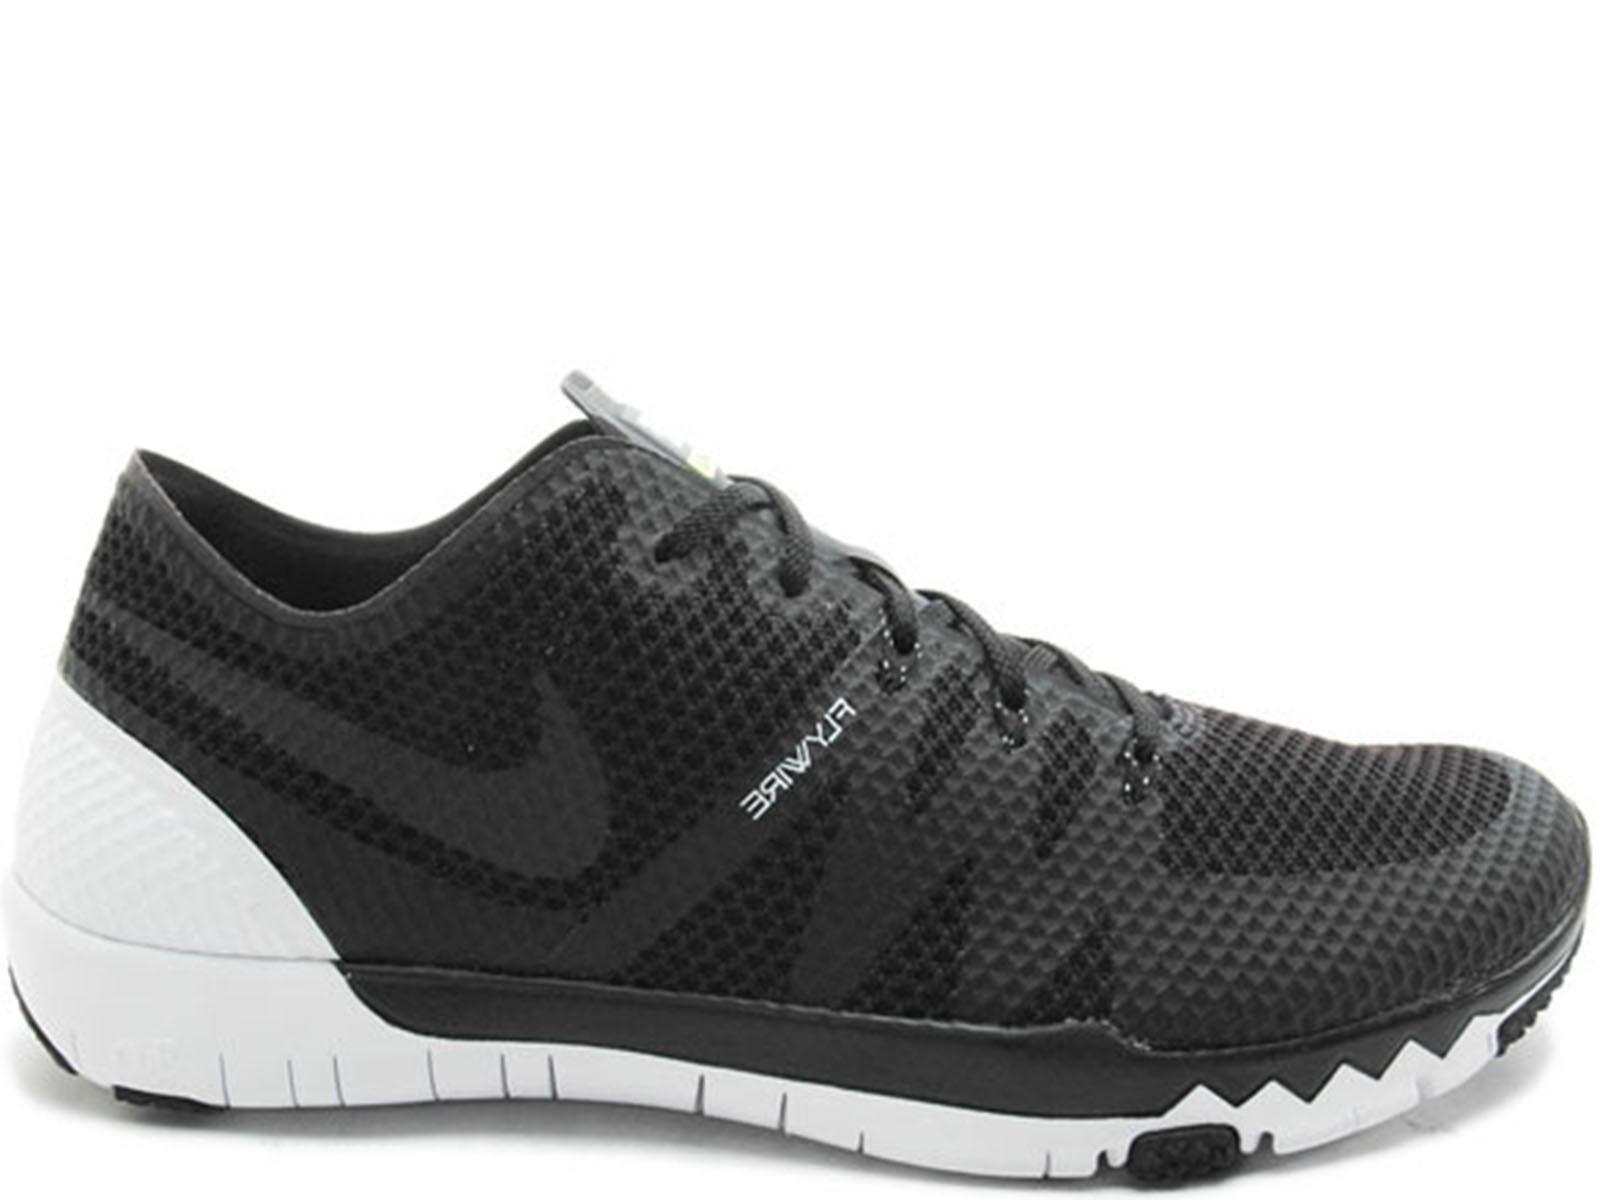 Brand new v3 nike libera trainer 3,0 v3 new uomini 'atletico moda scarpe da ginnastica [705270 001] b71e7e